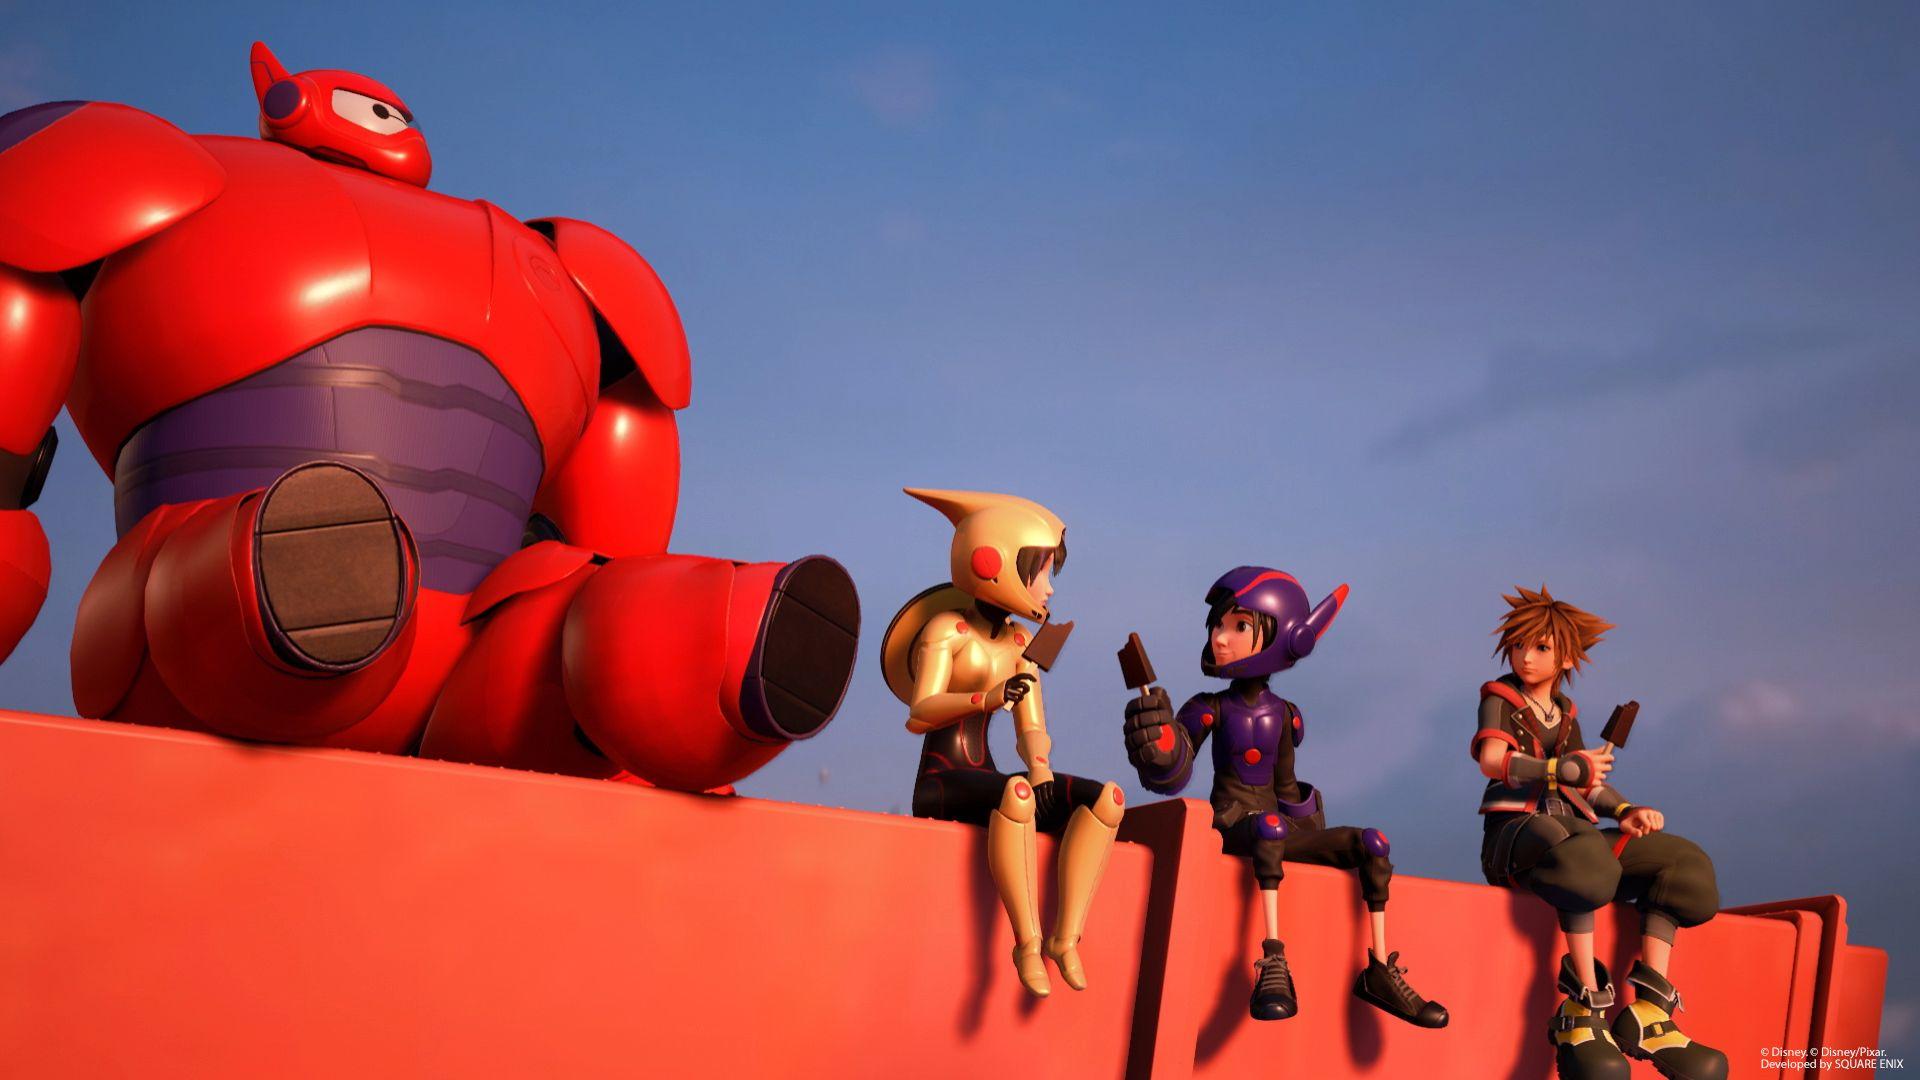 Kingdom Hearts 3 Screenshot 3